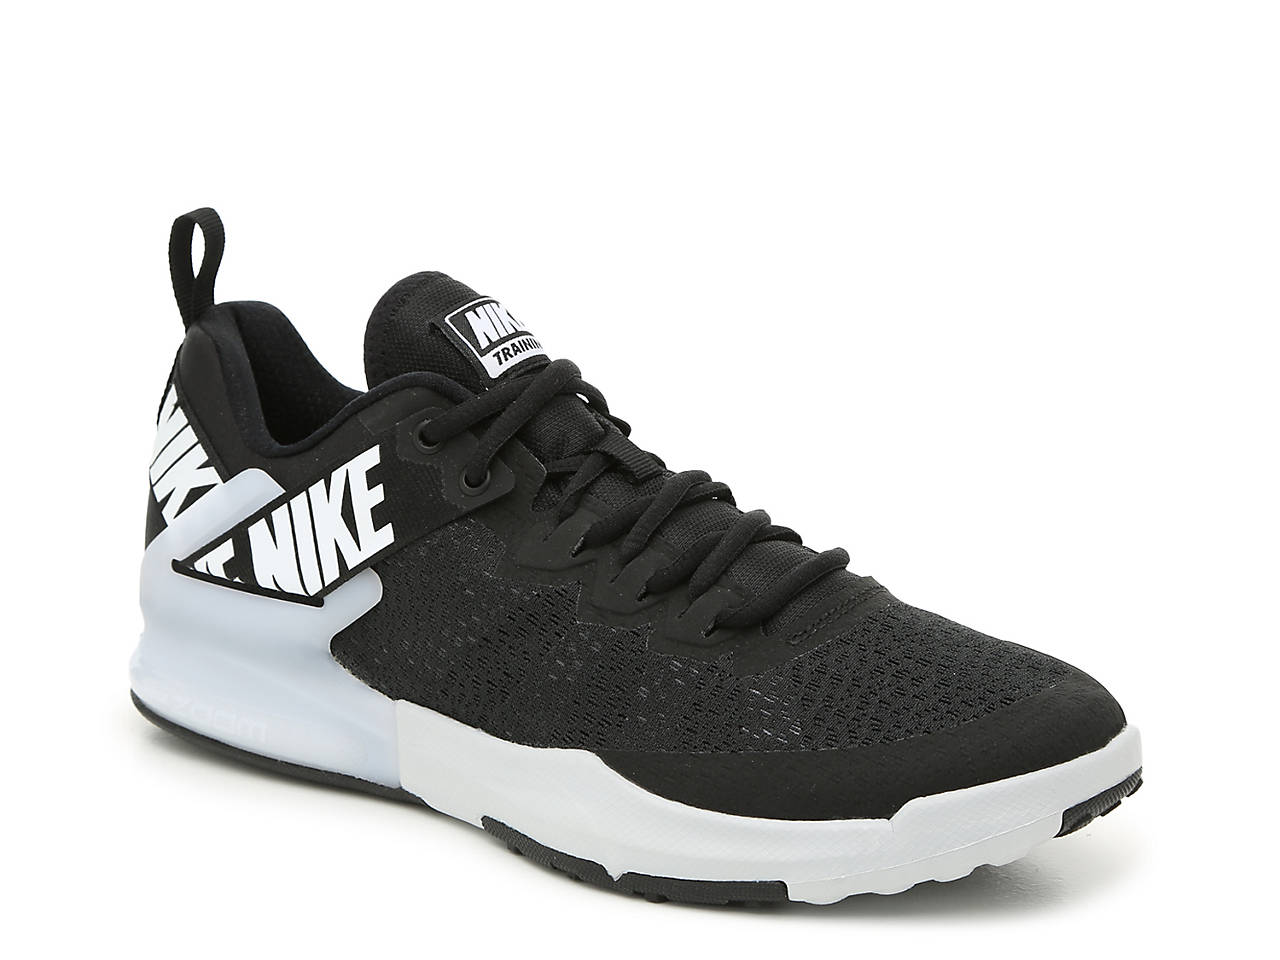 new style b9c4e cf901 Zoom Domination TR 2 Training Shoe - Men s